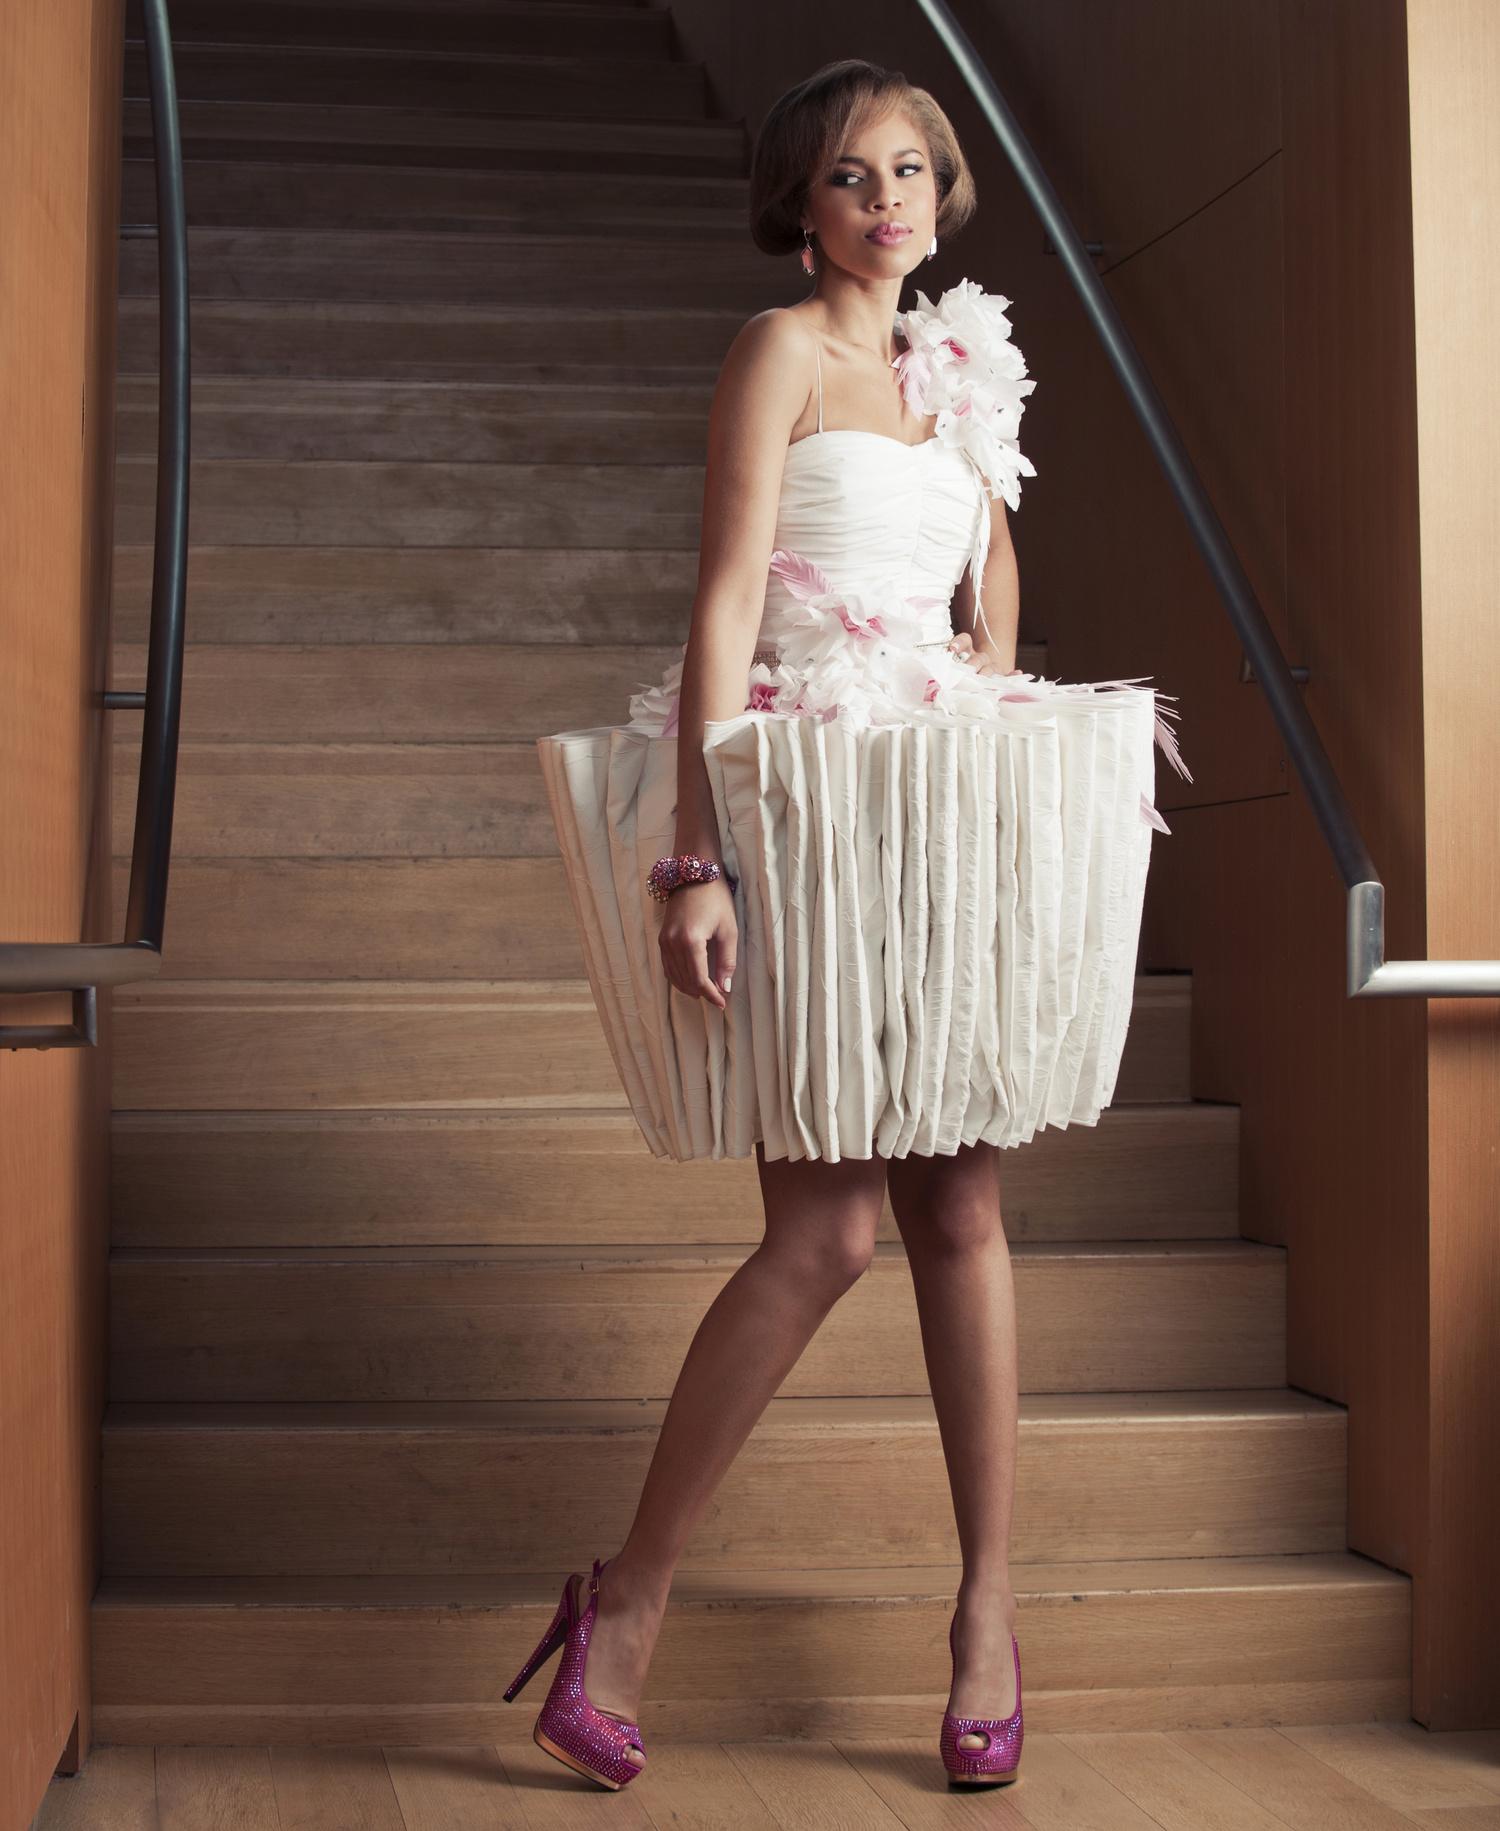 White-Cashmere-Collection-2013-David-Dixon-Photographer-Caitlin-Cronenberg.jpg